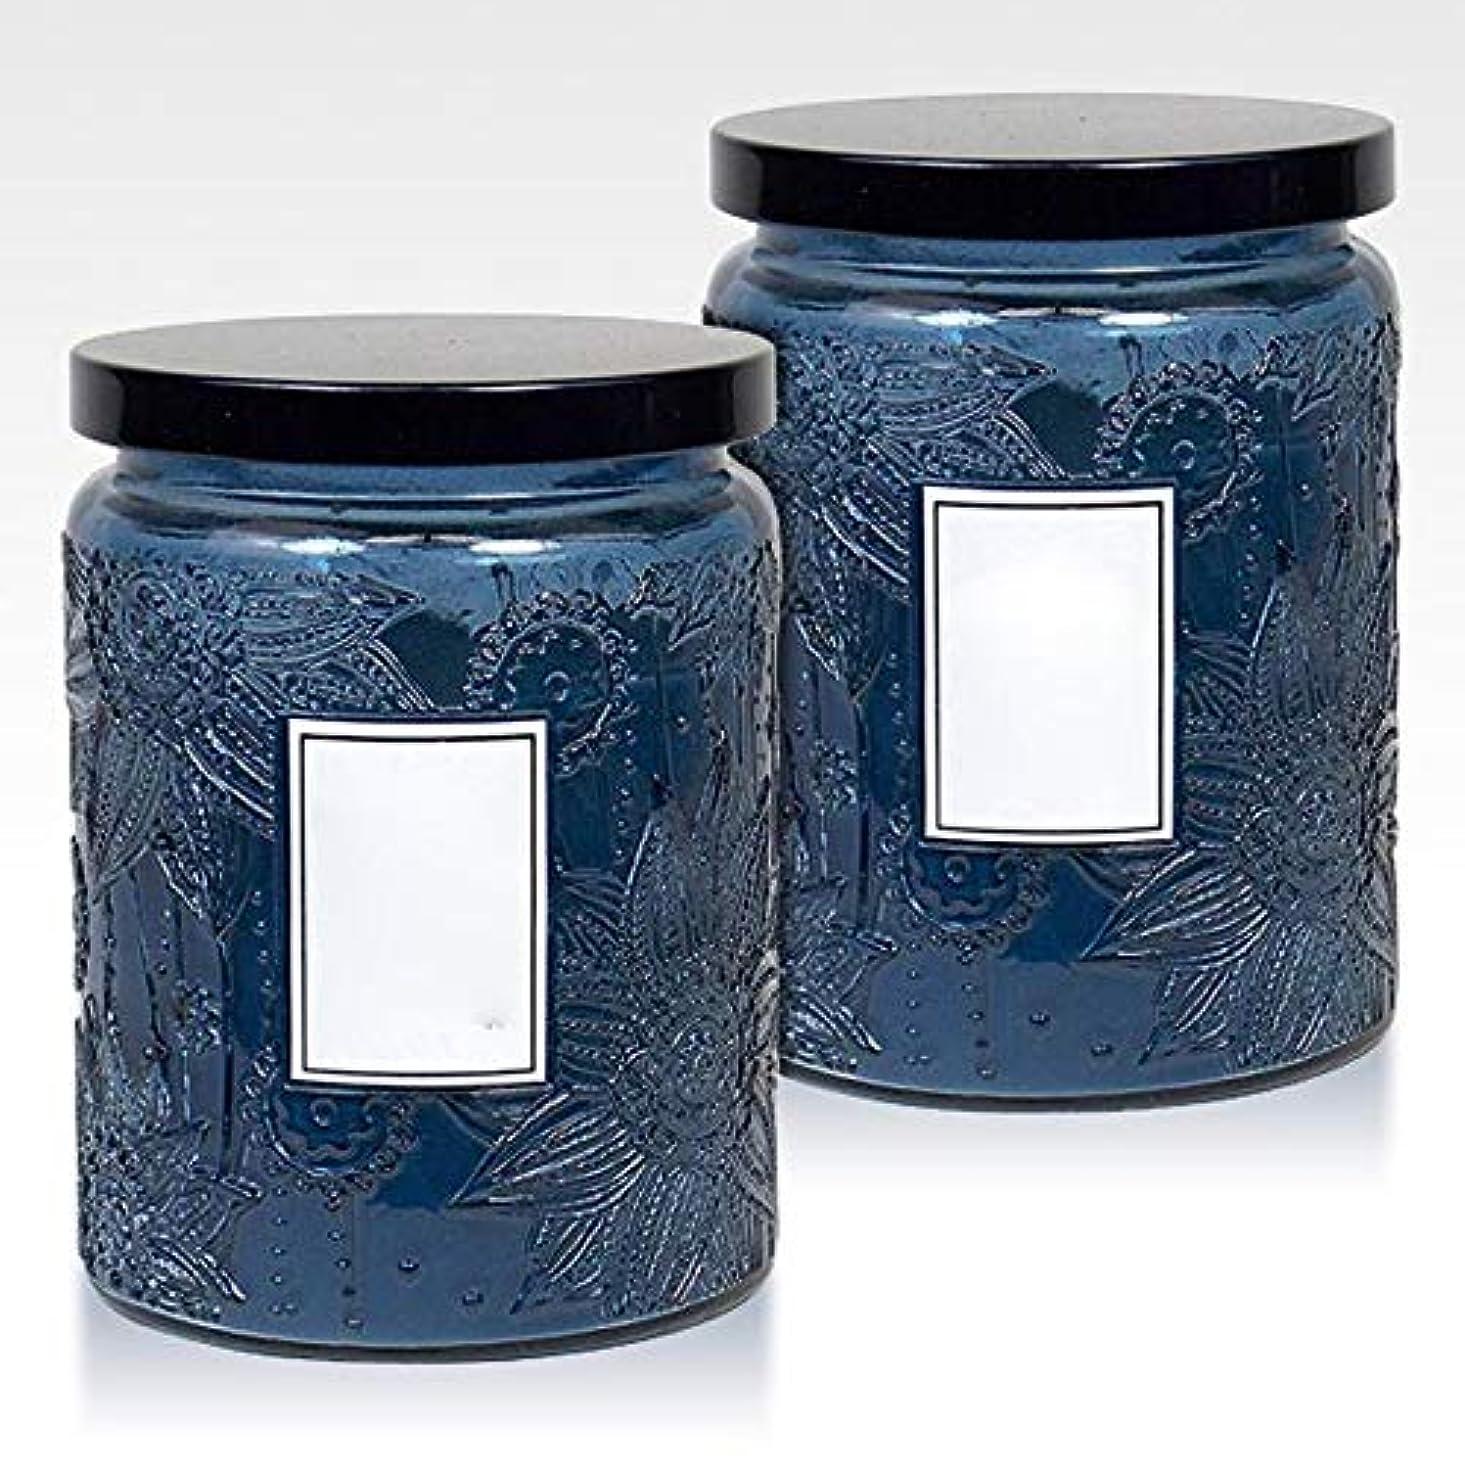 16Oz大きい缶2つの中心の香料入りの蝋燭の環境に優しい植物の精油の大豆のワックスの無煙蝋燭セット(5箱)